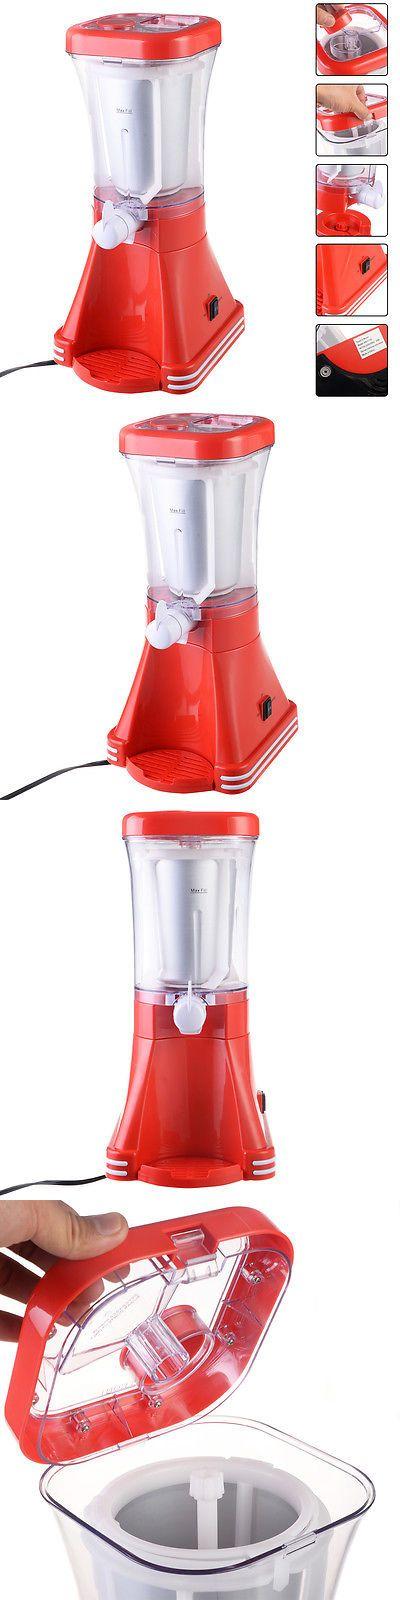 Blenders Countertop 133704: New Slush Drink Maker Retro Machine Blender Ice Slushie Margarita Slurpee Frozen -> BUY IT NOW ONLY: $35.99 on eBay!